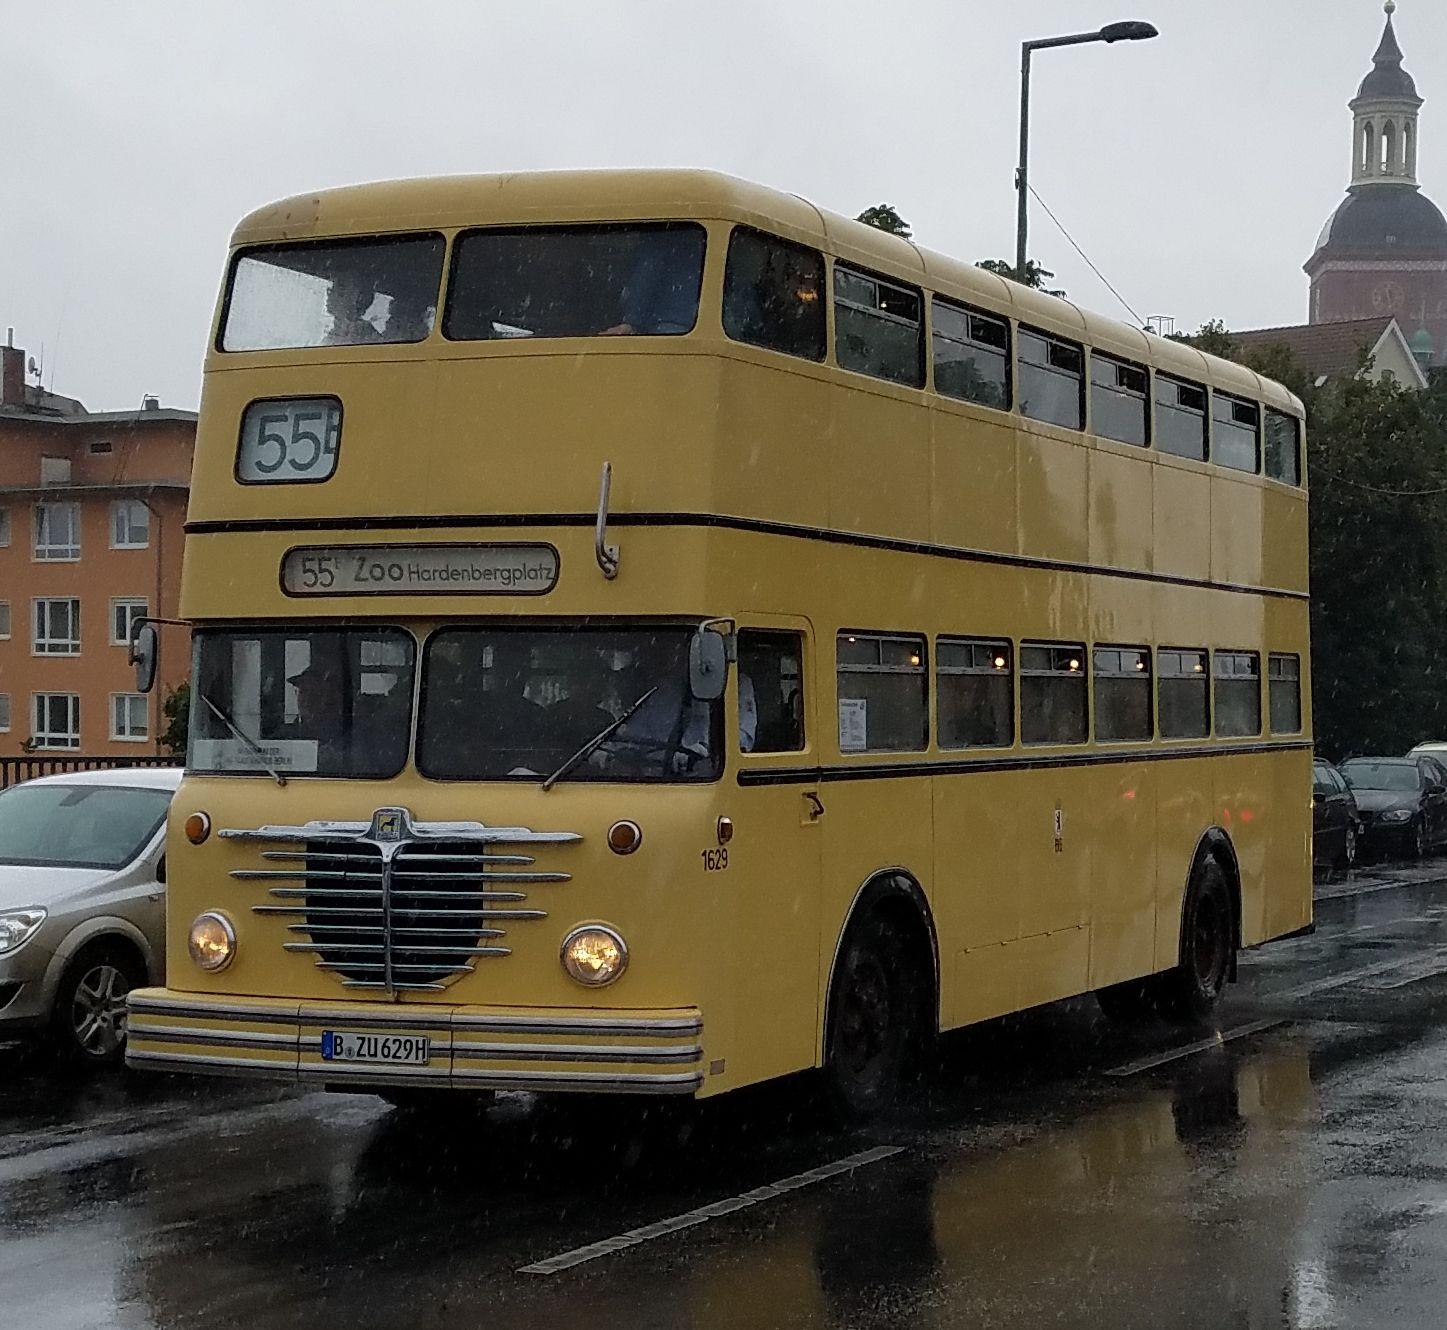 Foto: Bus 1629, Typ Bü D2U 64, Berlin-Spandau, Oktober 2017